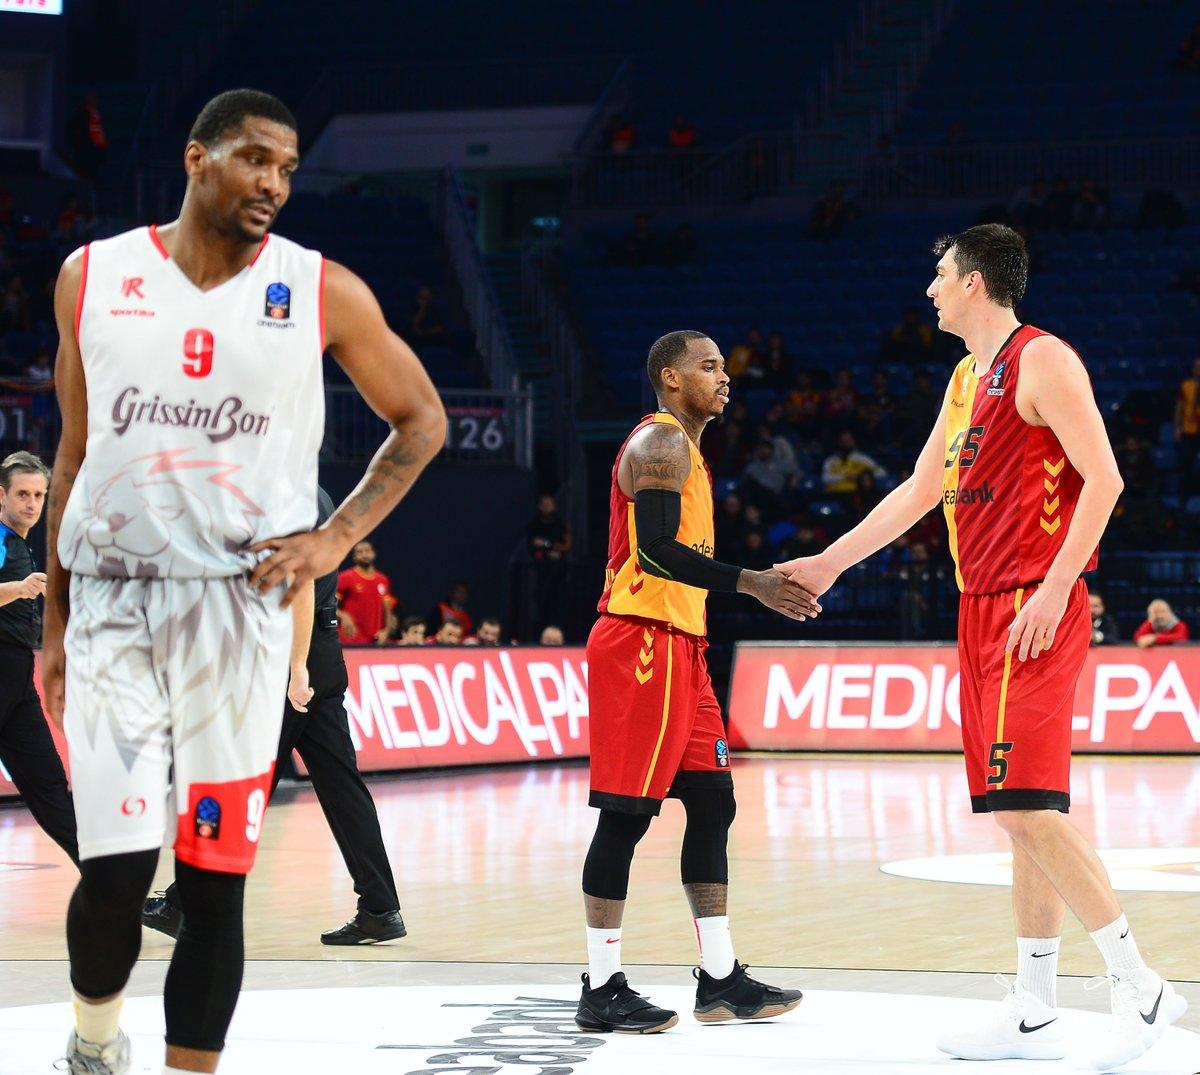 Galatasaray Odeabank, İtalyan Reggio Emilia'yı mağlup etti